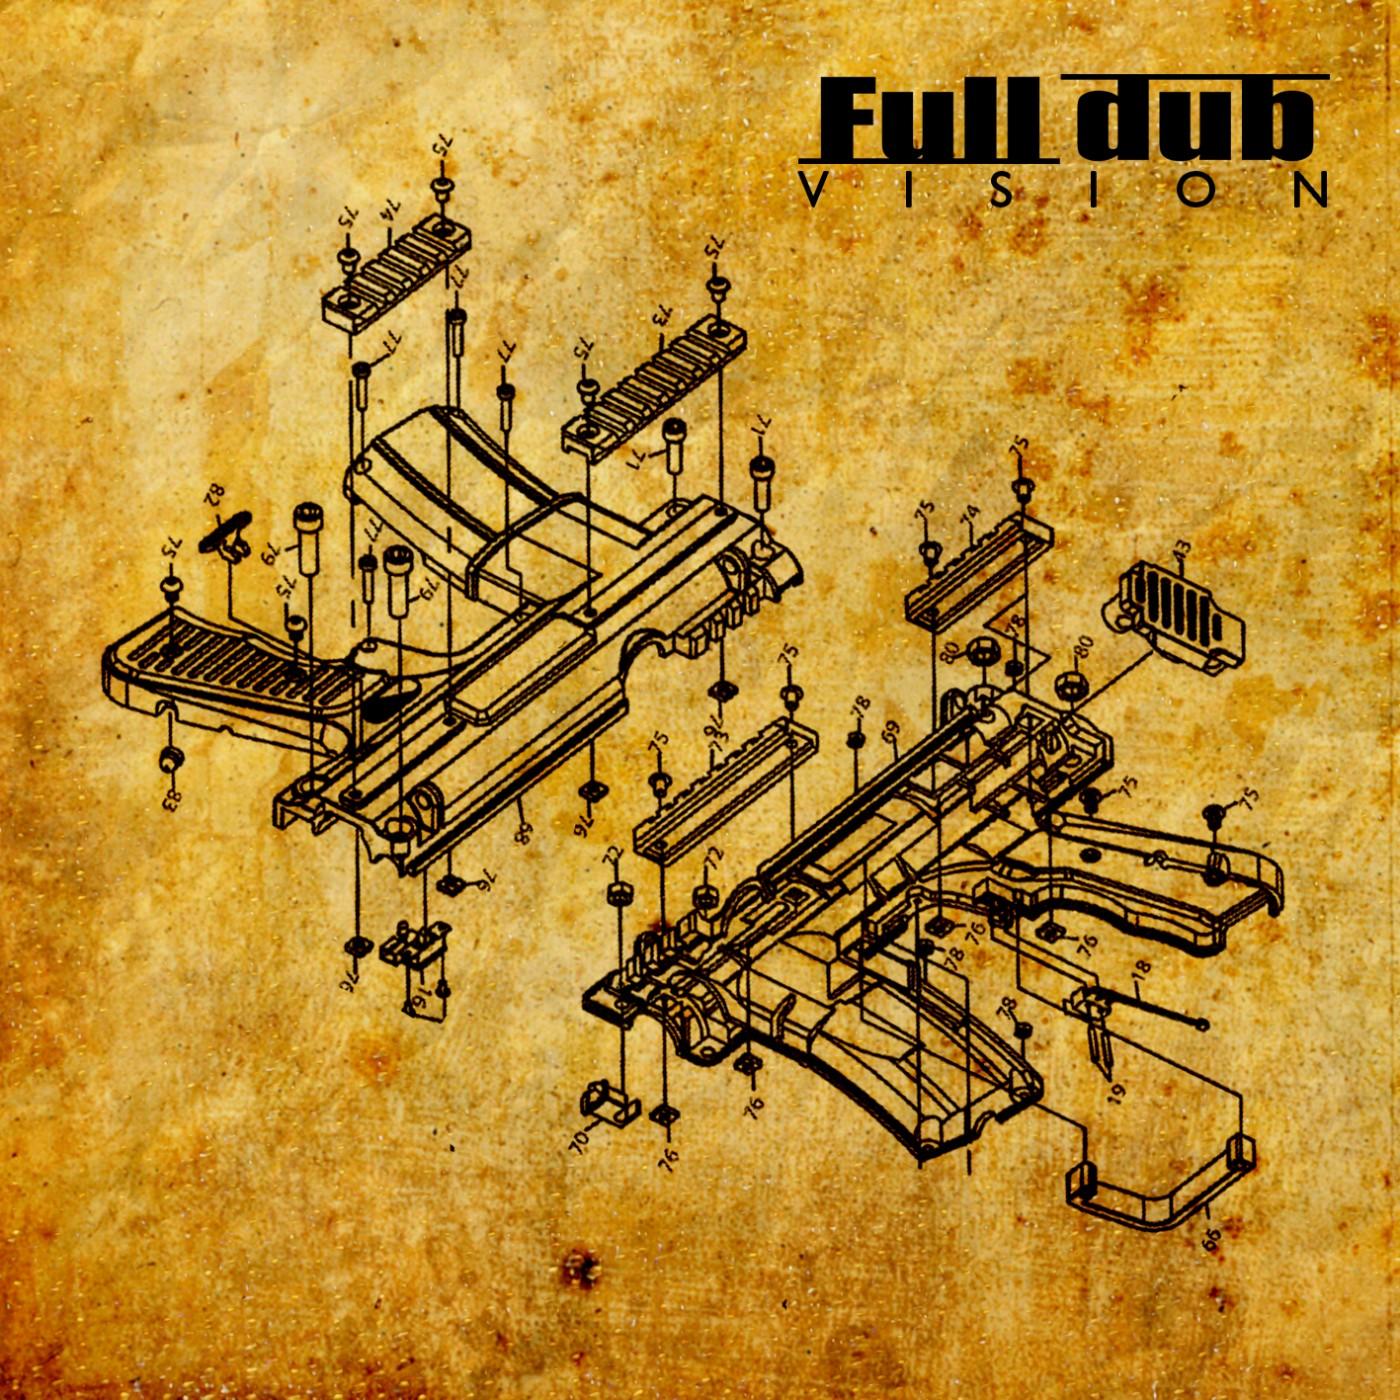 fulldub vision